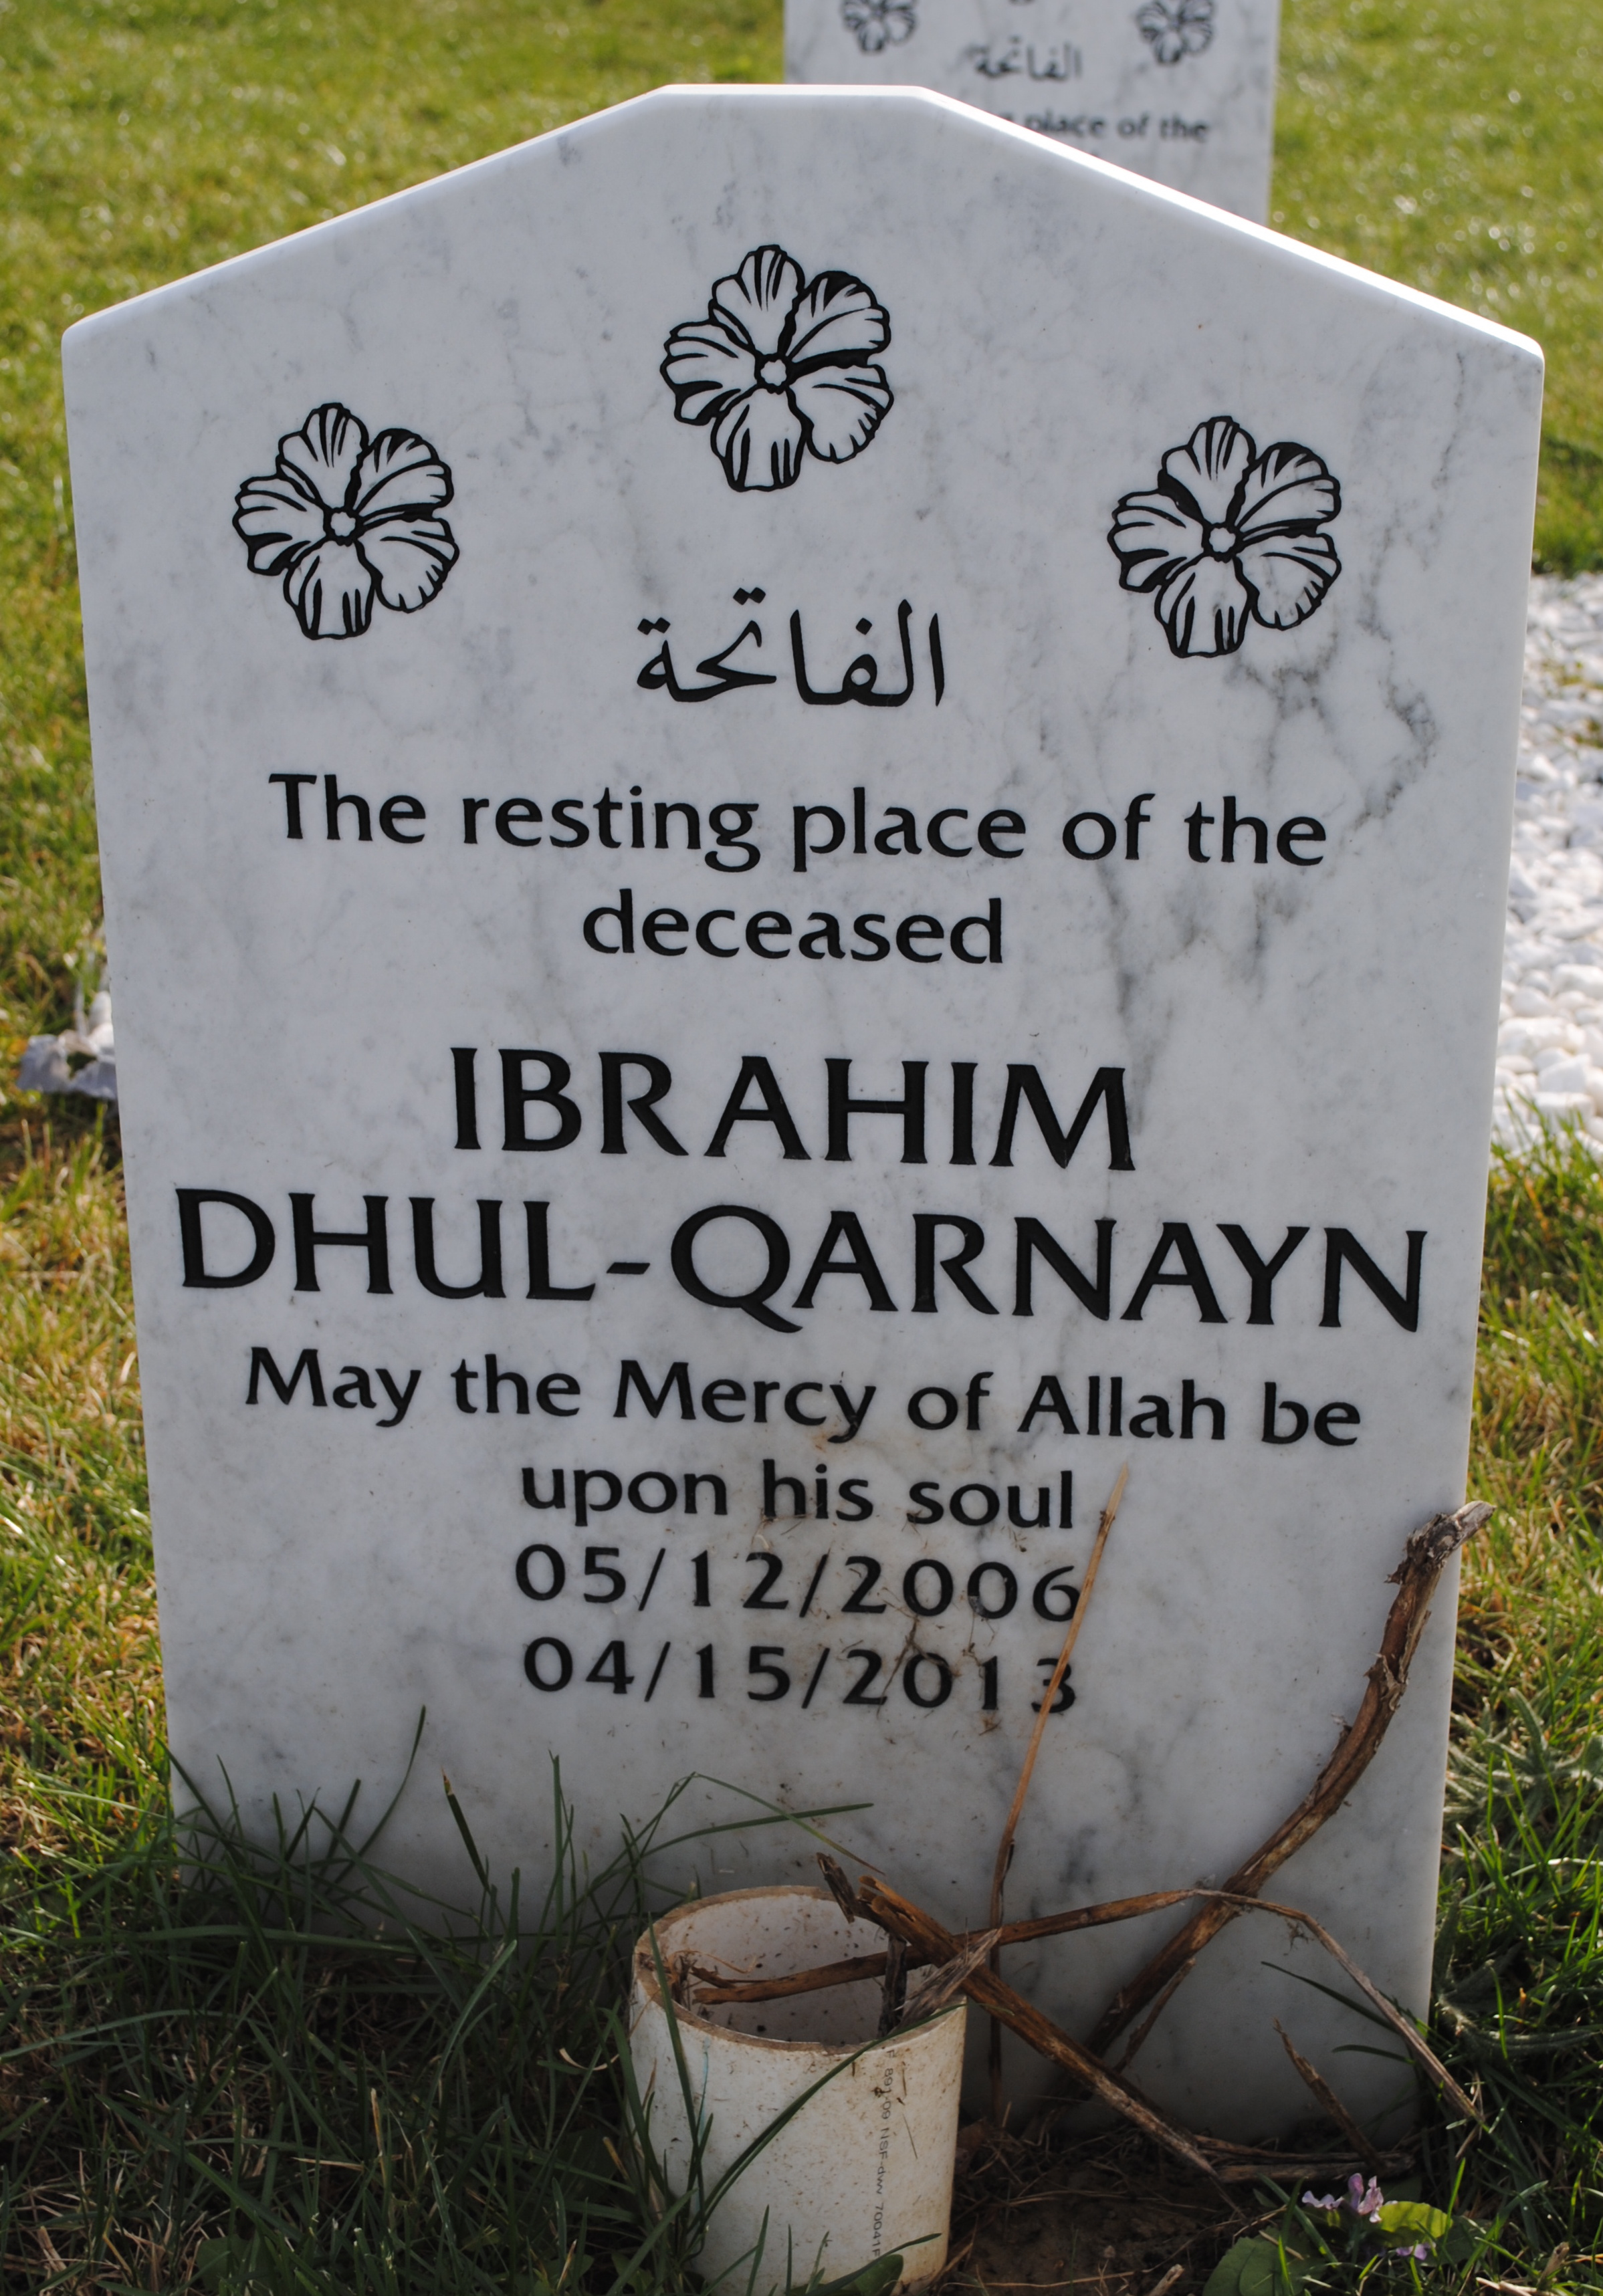 Ibrahim Dhul-Qarnayn (2006-2013) - Find A Grave Memorial